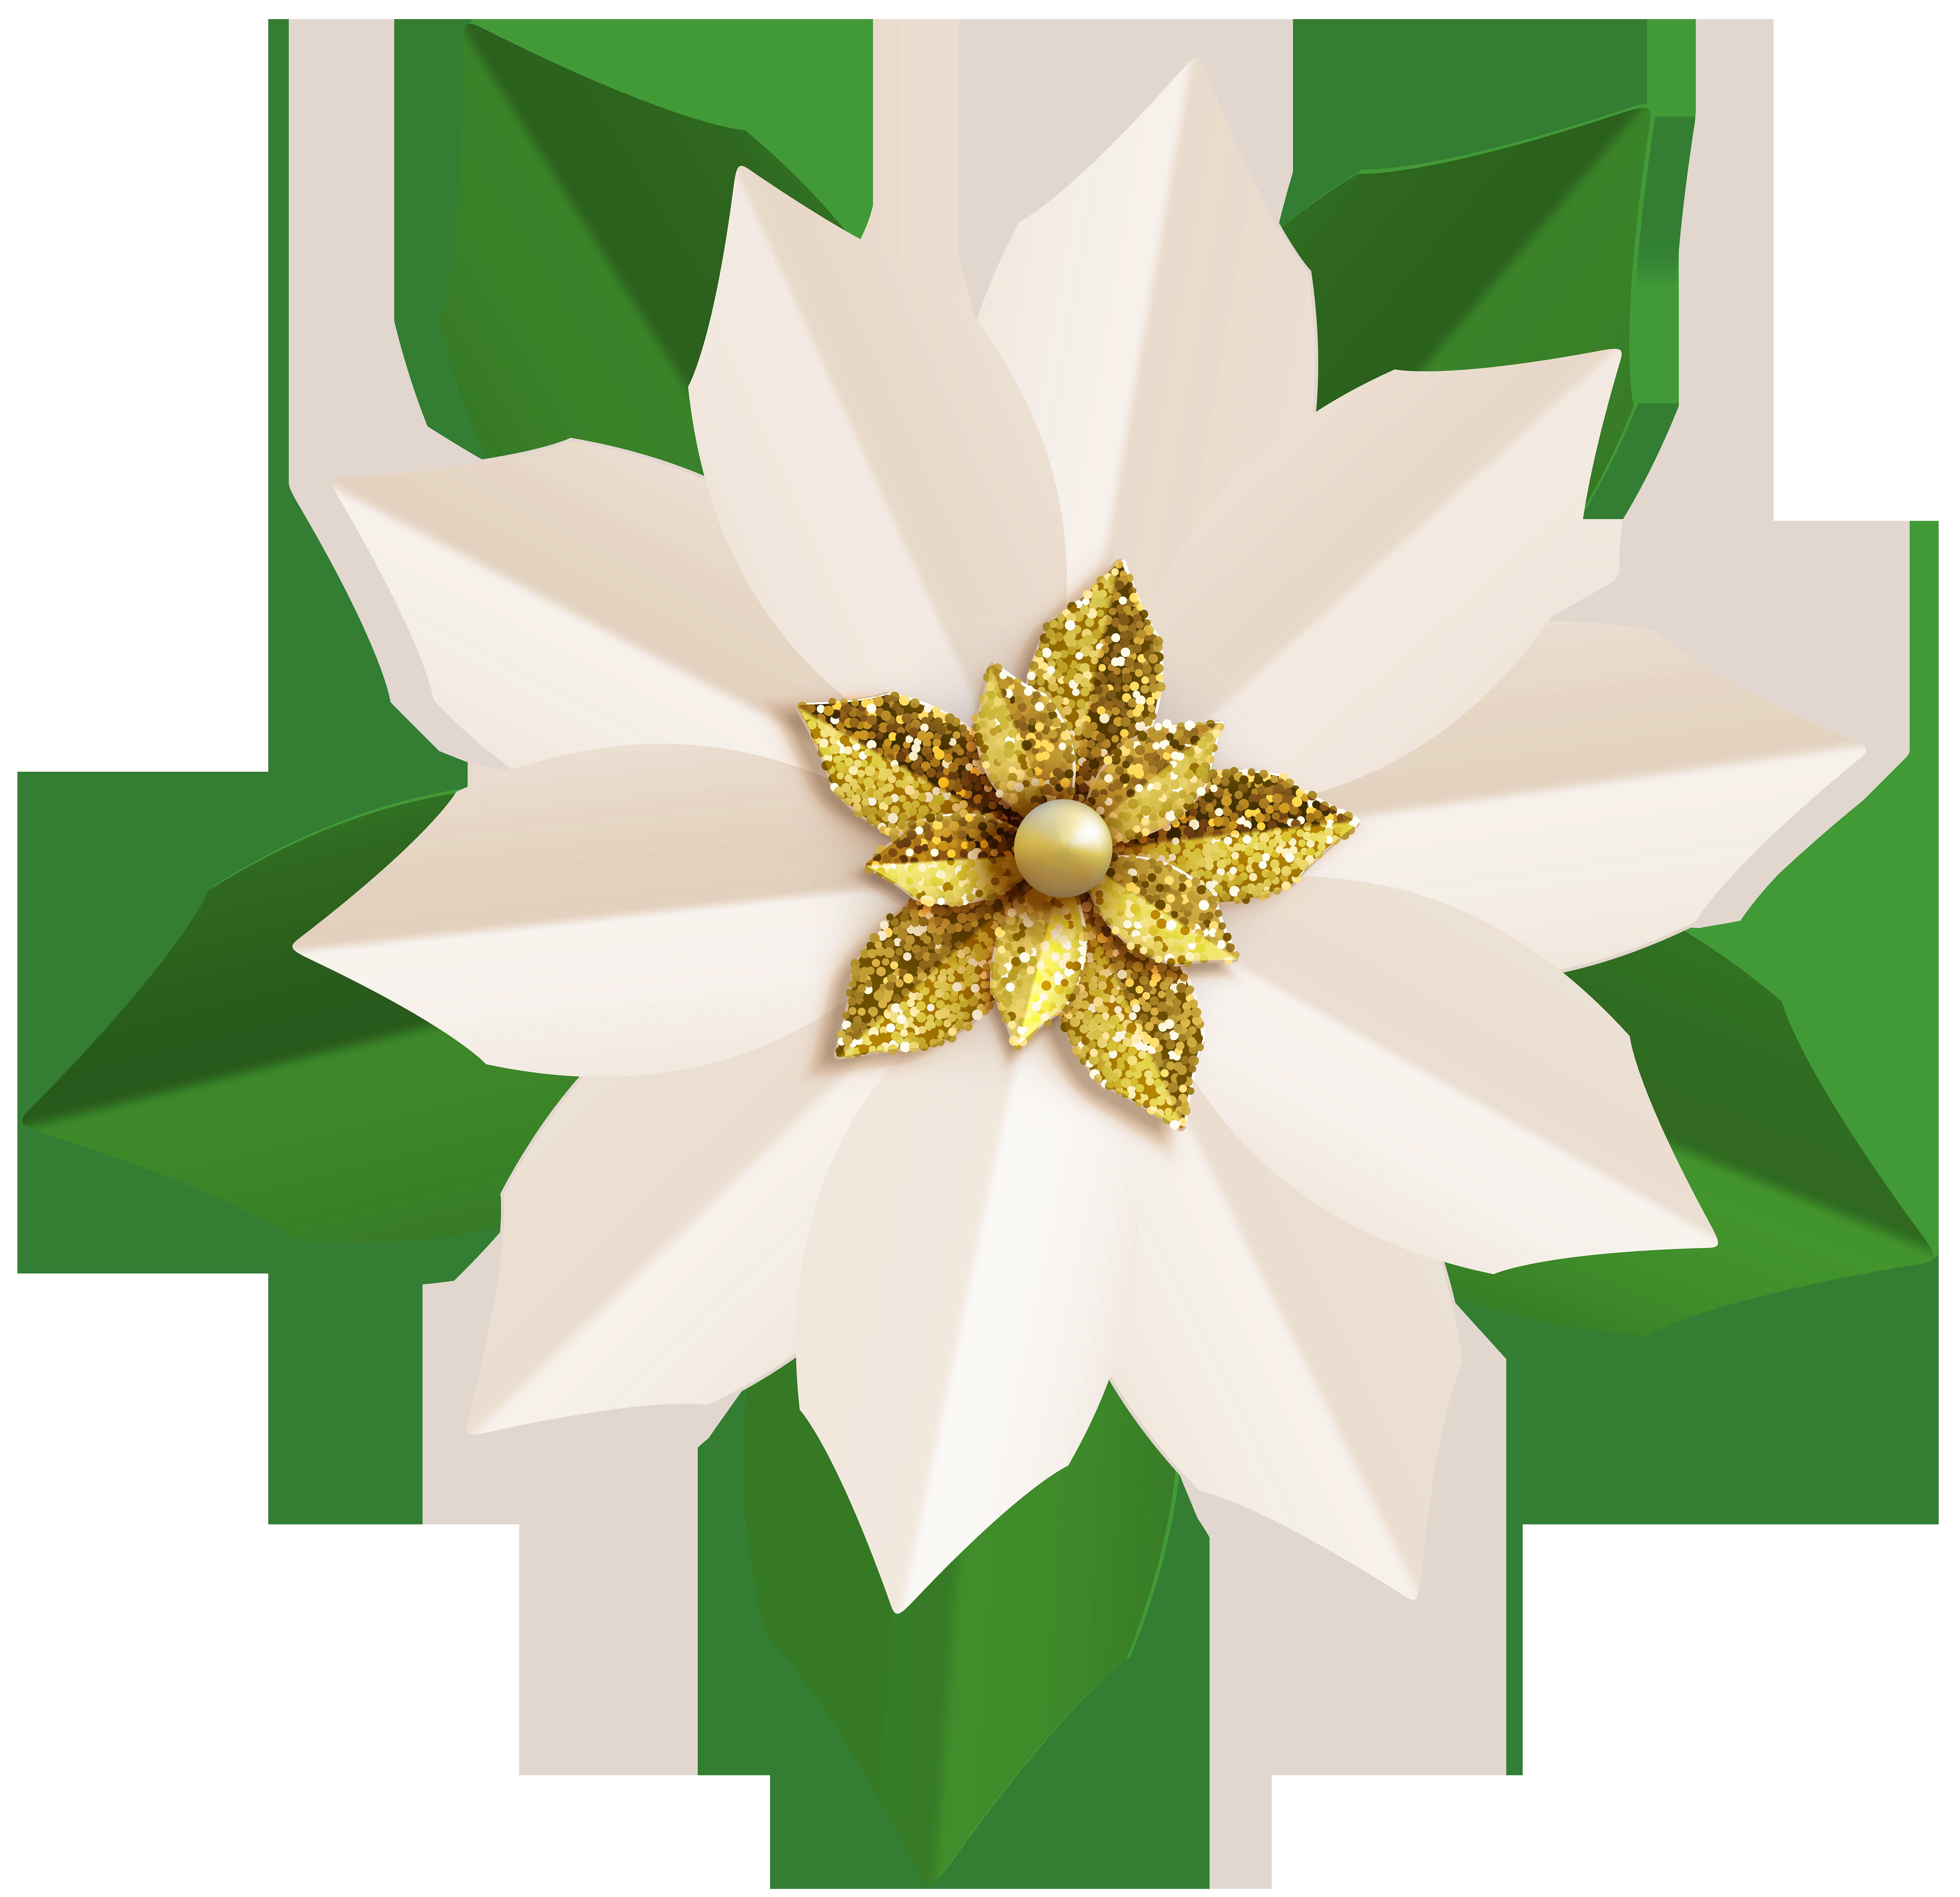 Christmas White Poinsettia PNG Clip Art Image.